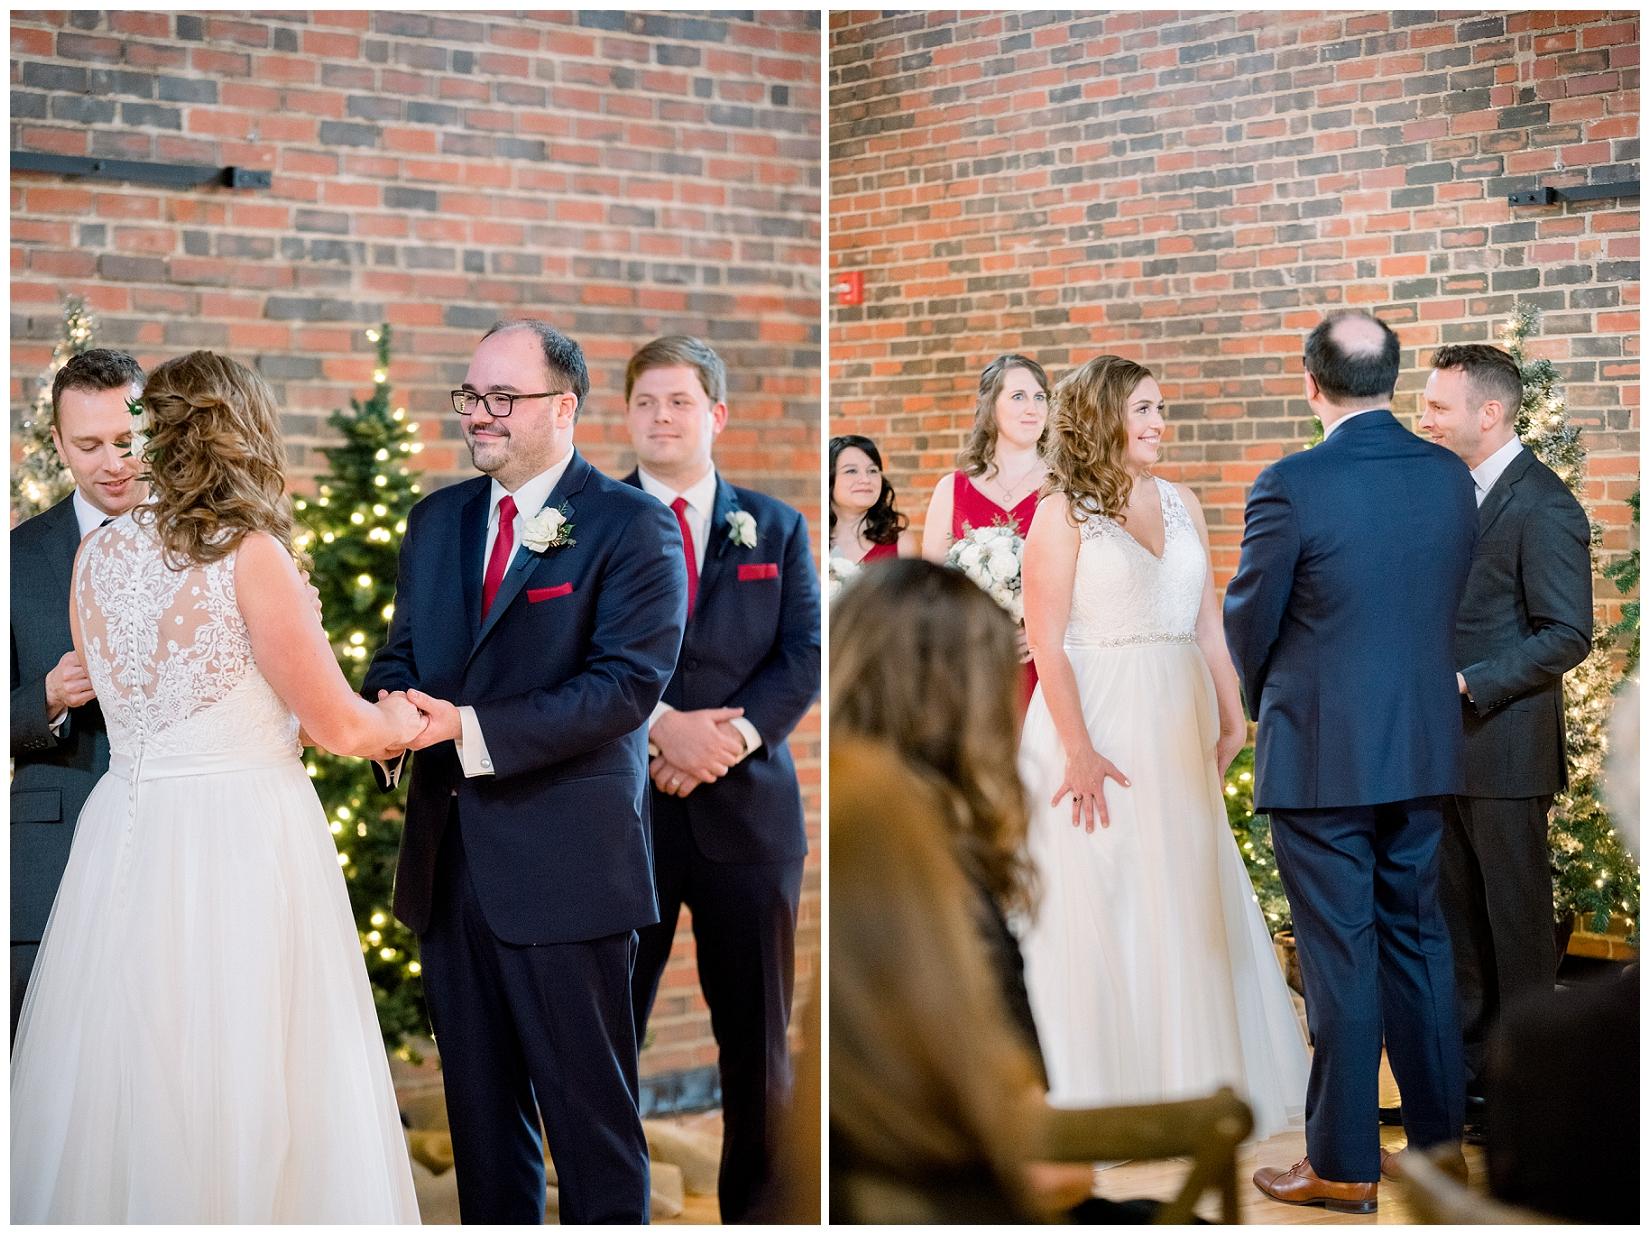 cat-alkire-wedding-photographer-indiana-chicago-indianapolis-fort-wayne_0946.jpg